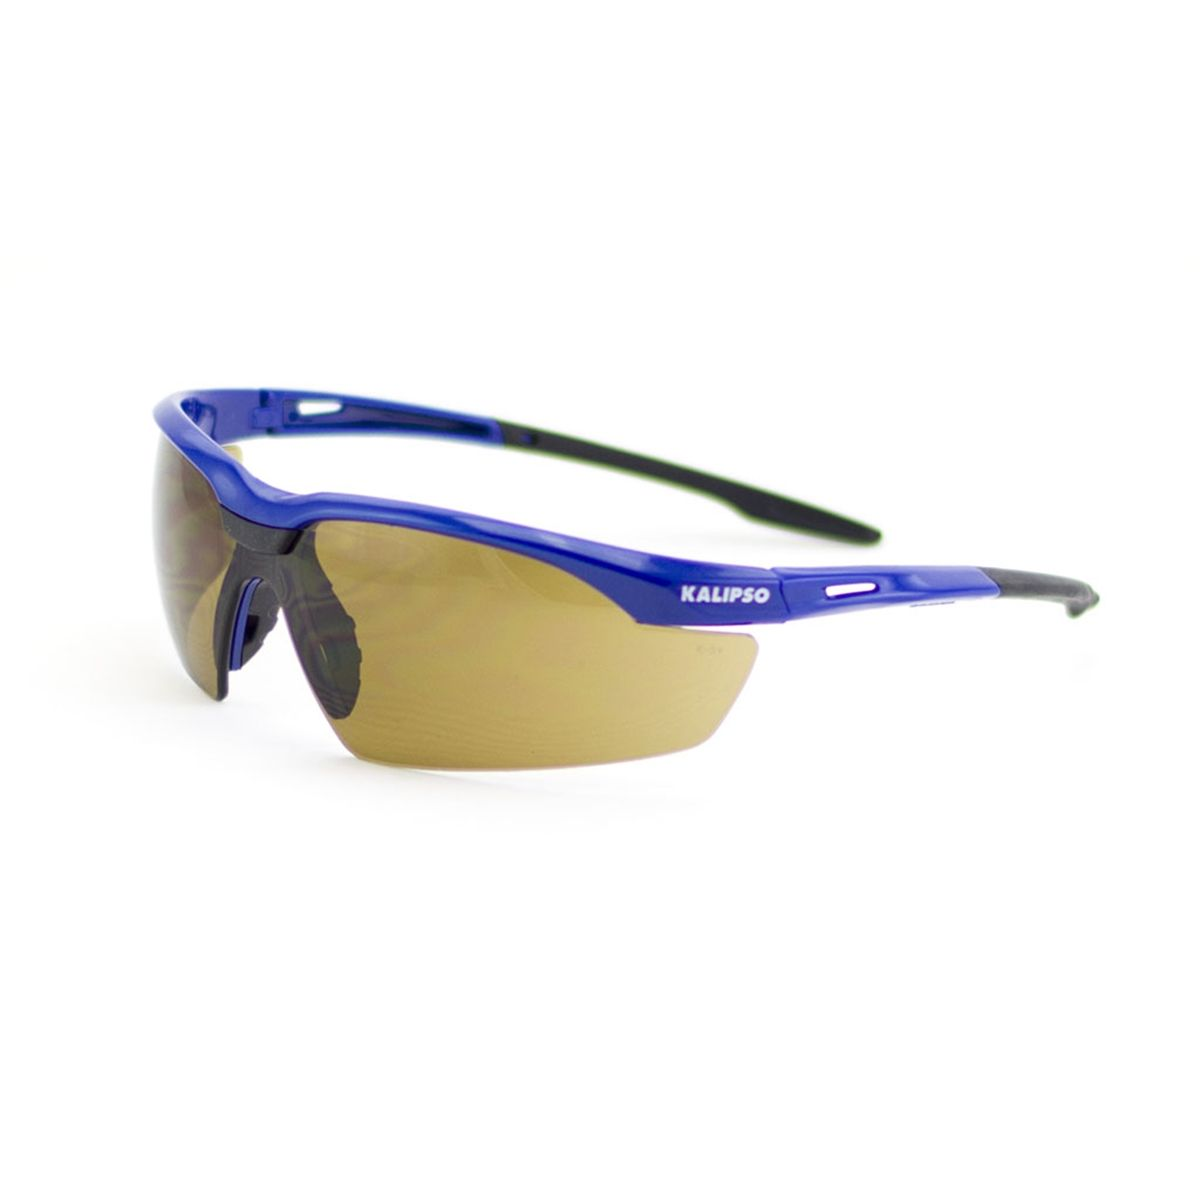 11e69a592d4b5 Óculos de Segurança Kalipso Veneza Ca 35157 Com Apoio Nasal - Compre ...